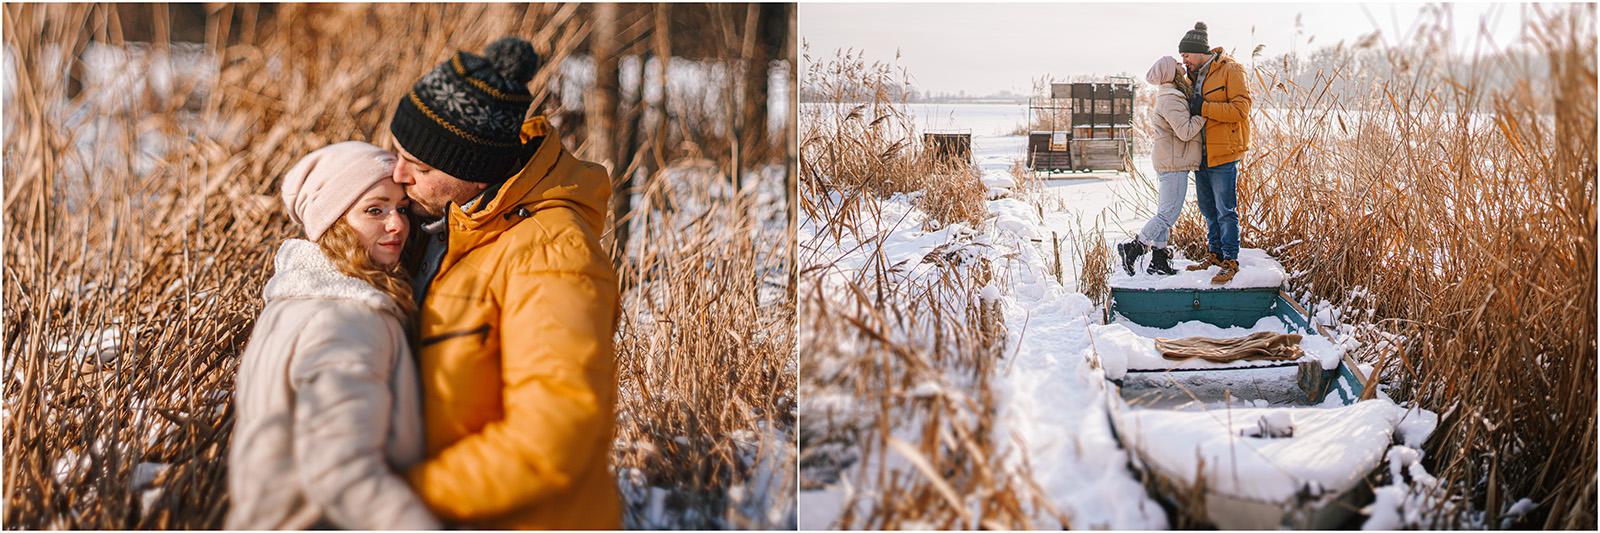 Paulina & Bartek | zimowa sesja nad jeziorem 19